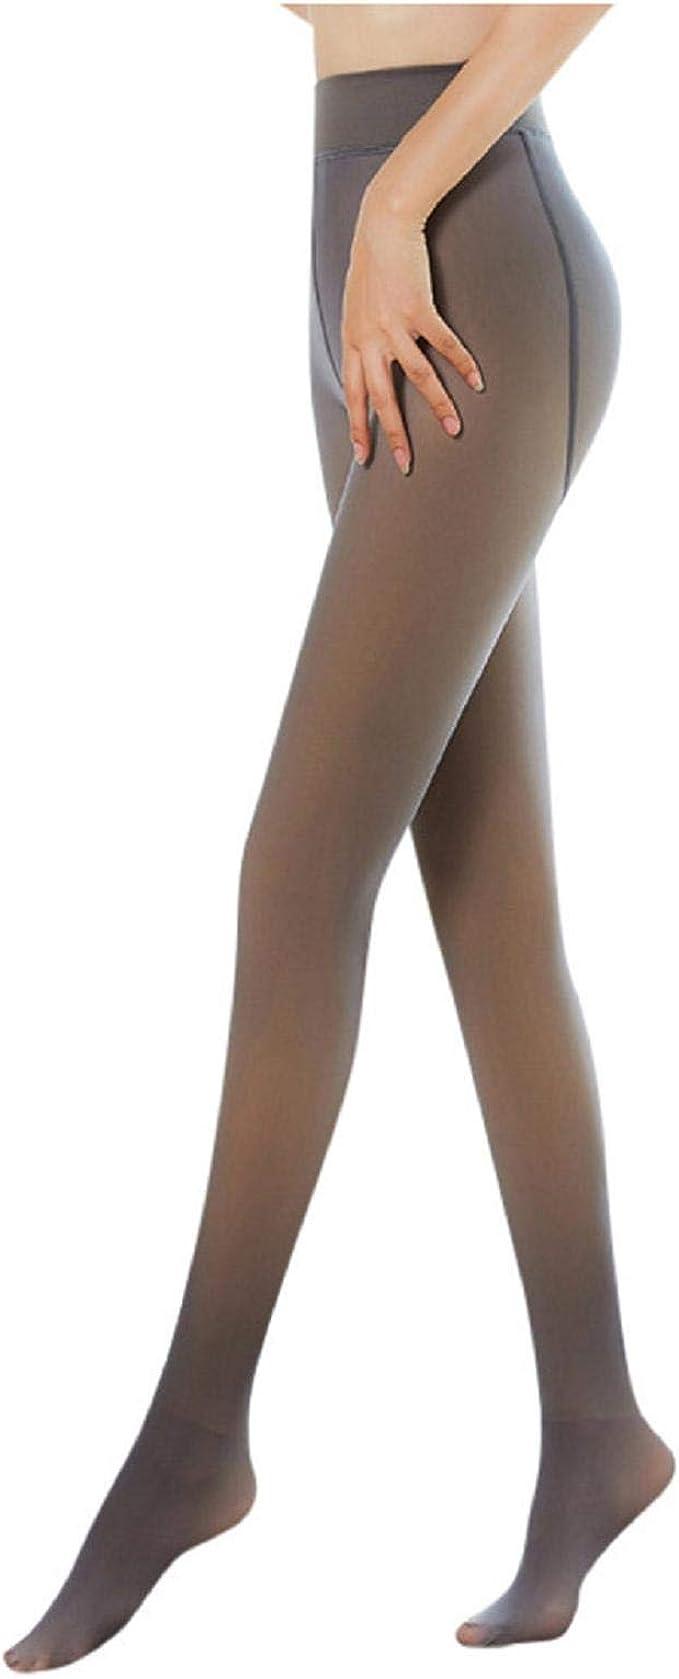 Flawless Legs Fake Translucent Winter Fleece Villi Thickened Pantyhose LOT LIU9